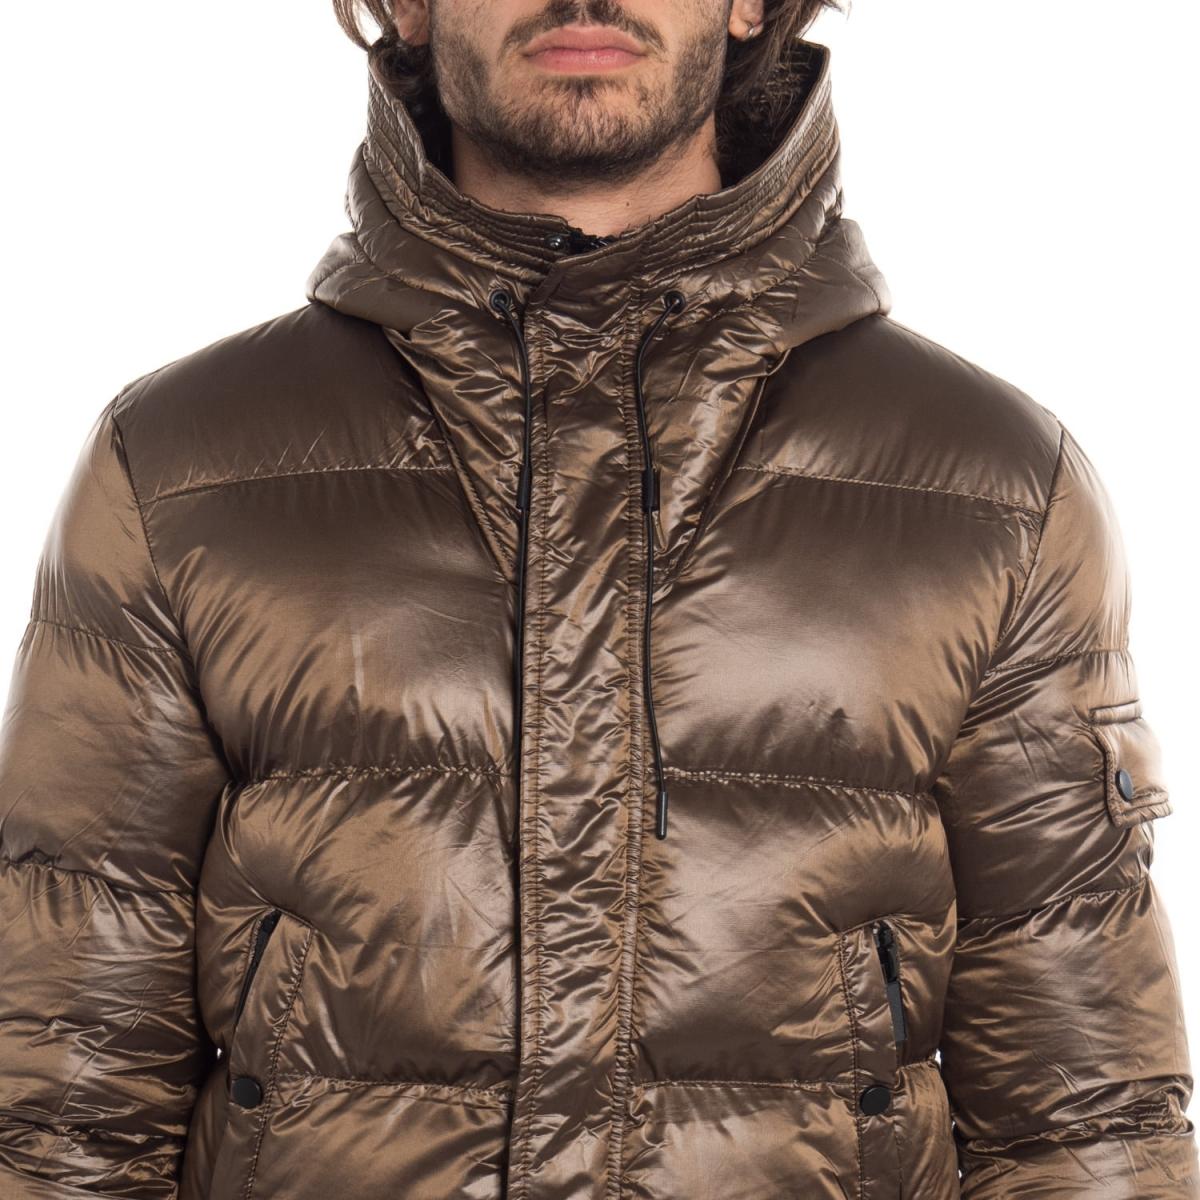 abbigliamento Giubbini uomo Piumino da uomo LPBBK12001 LANDEK PARK Cafedelmar Shop